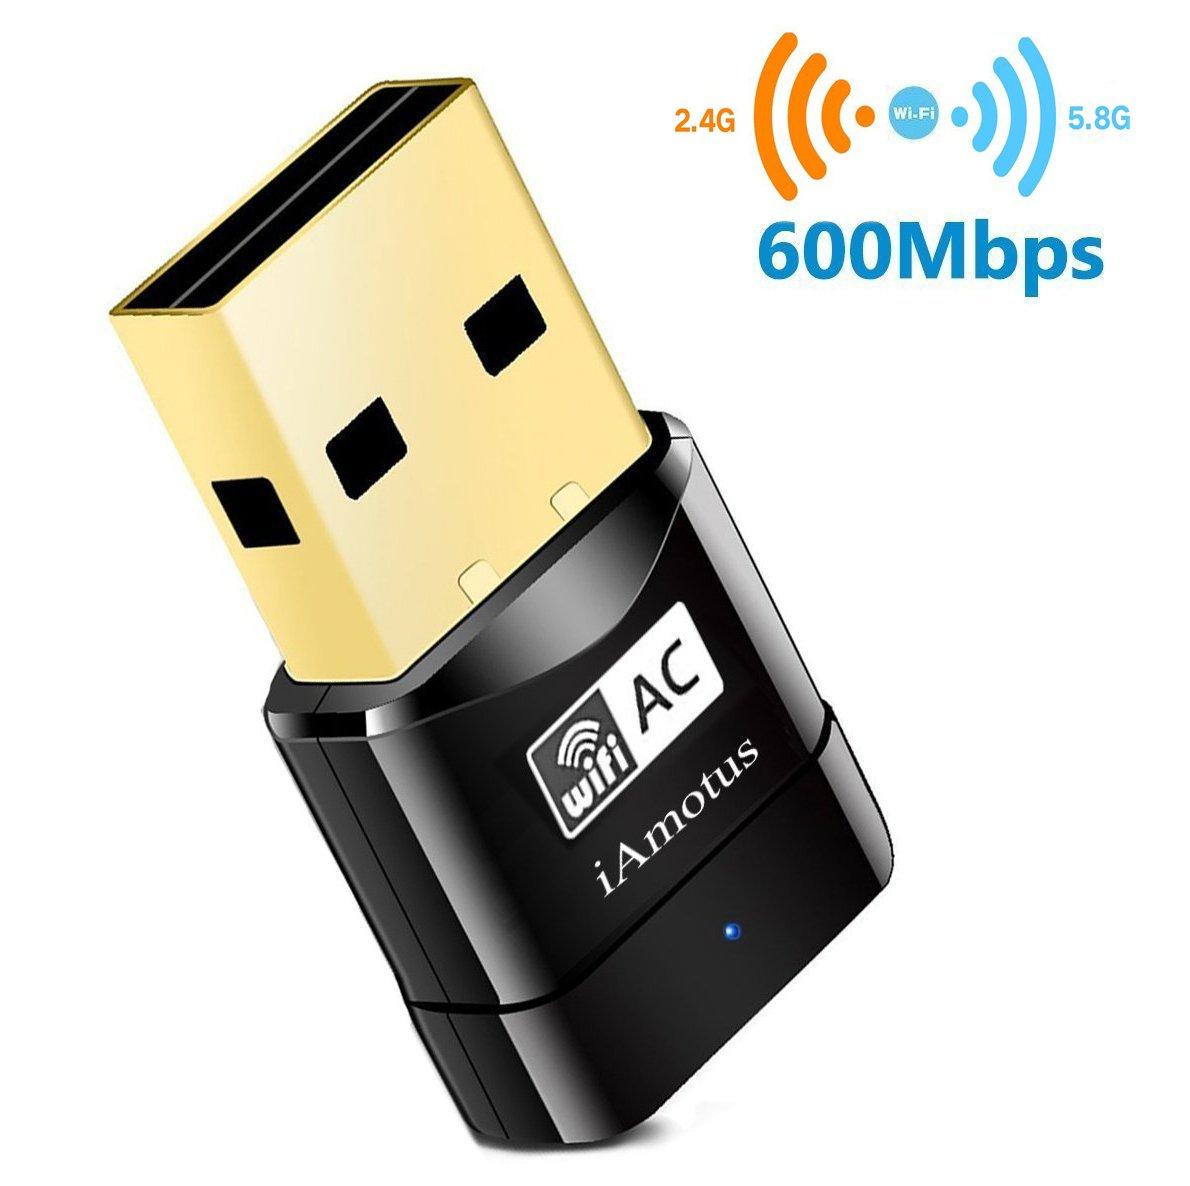 iAmotus USB WiFi Adaptateur [Garantie à 2 ans] AC600 Mbps Mini Double Bande Wireless WIFI (5GHz 433Mbps/2.4GHz 150Mbps) Sans fil Dongles Wlan Stick pour PC Windows XP/ Vista/ 7/ 8/ 10 Linux Mac OS 5B06